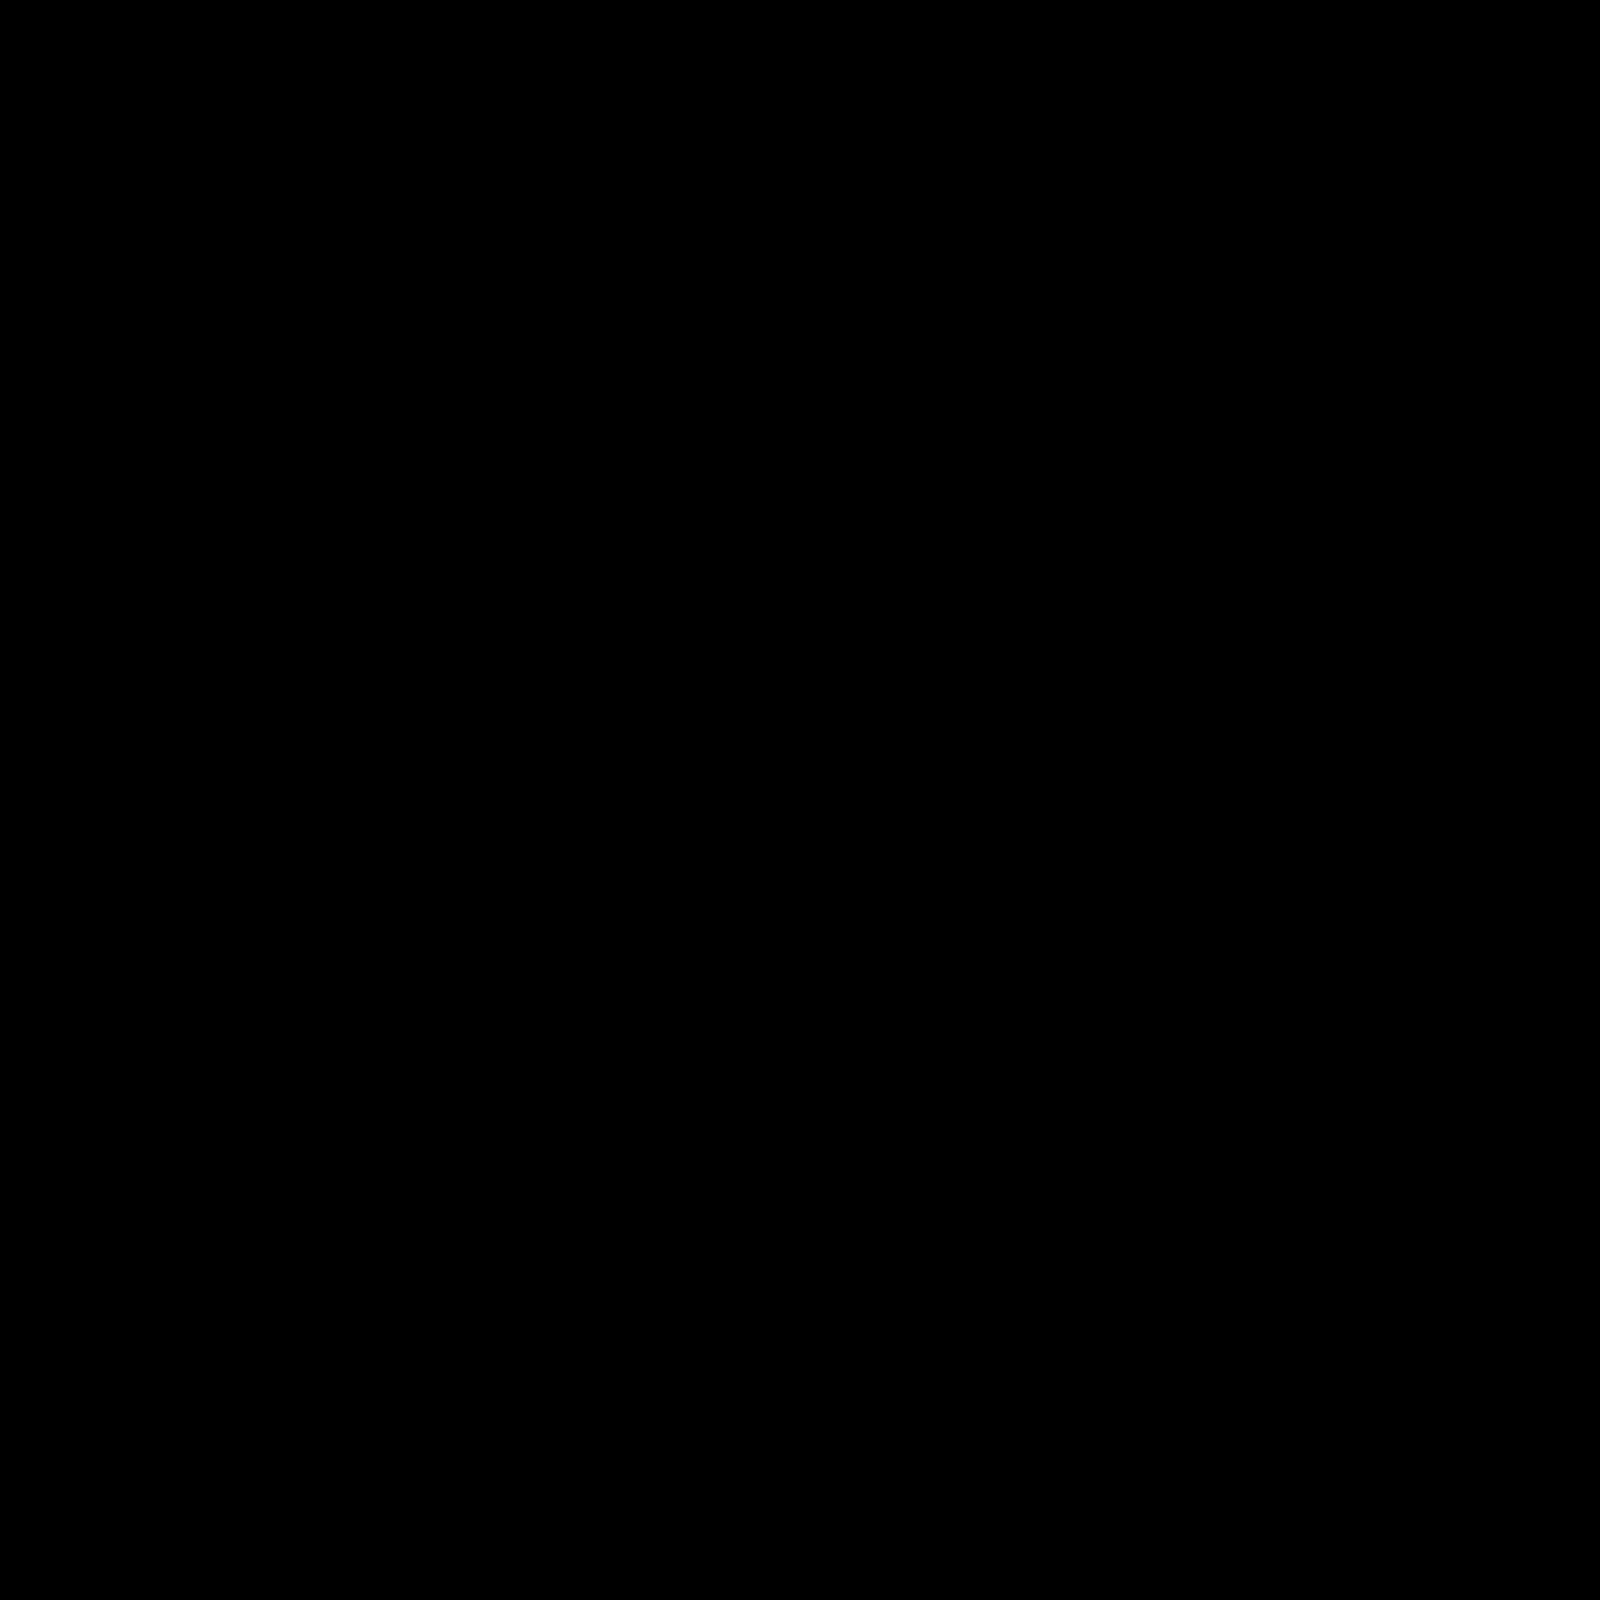 Twitter Logo Png Black